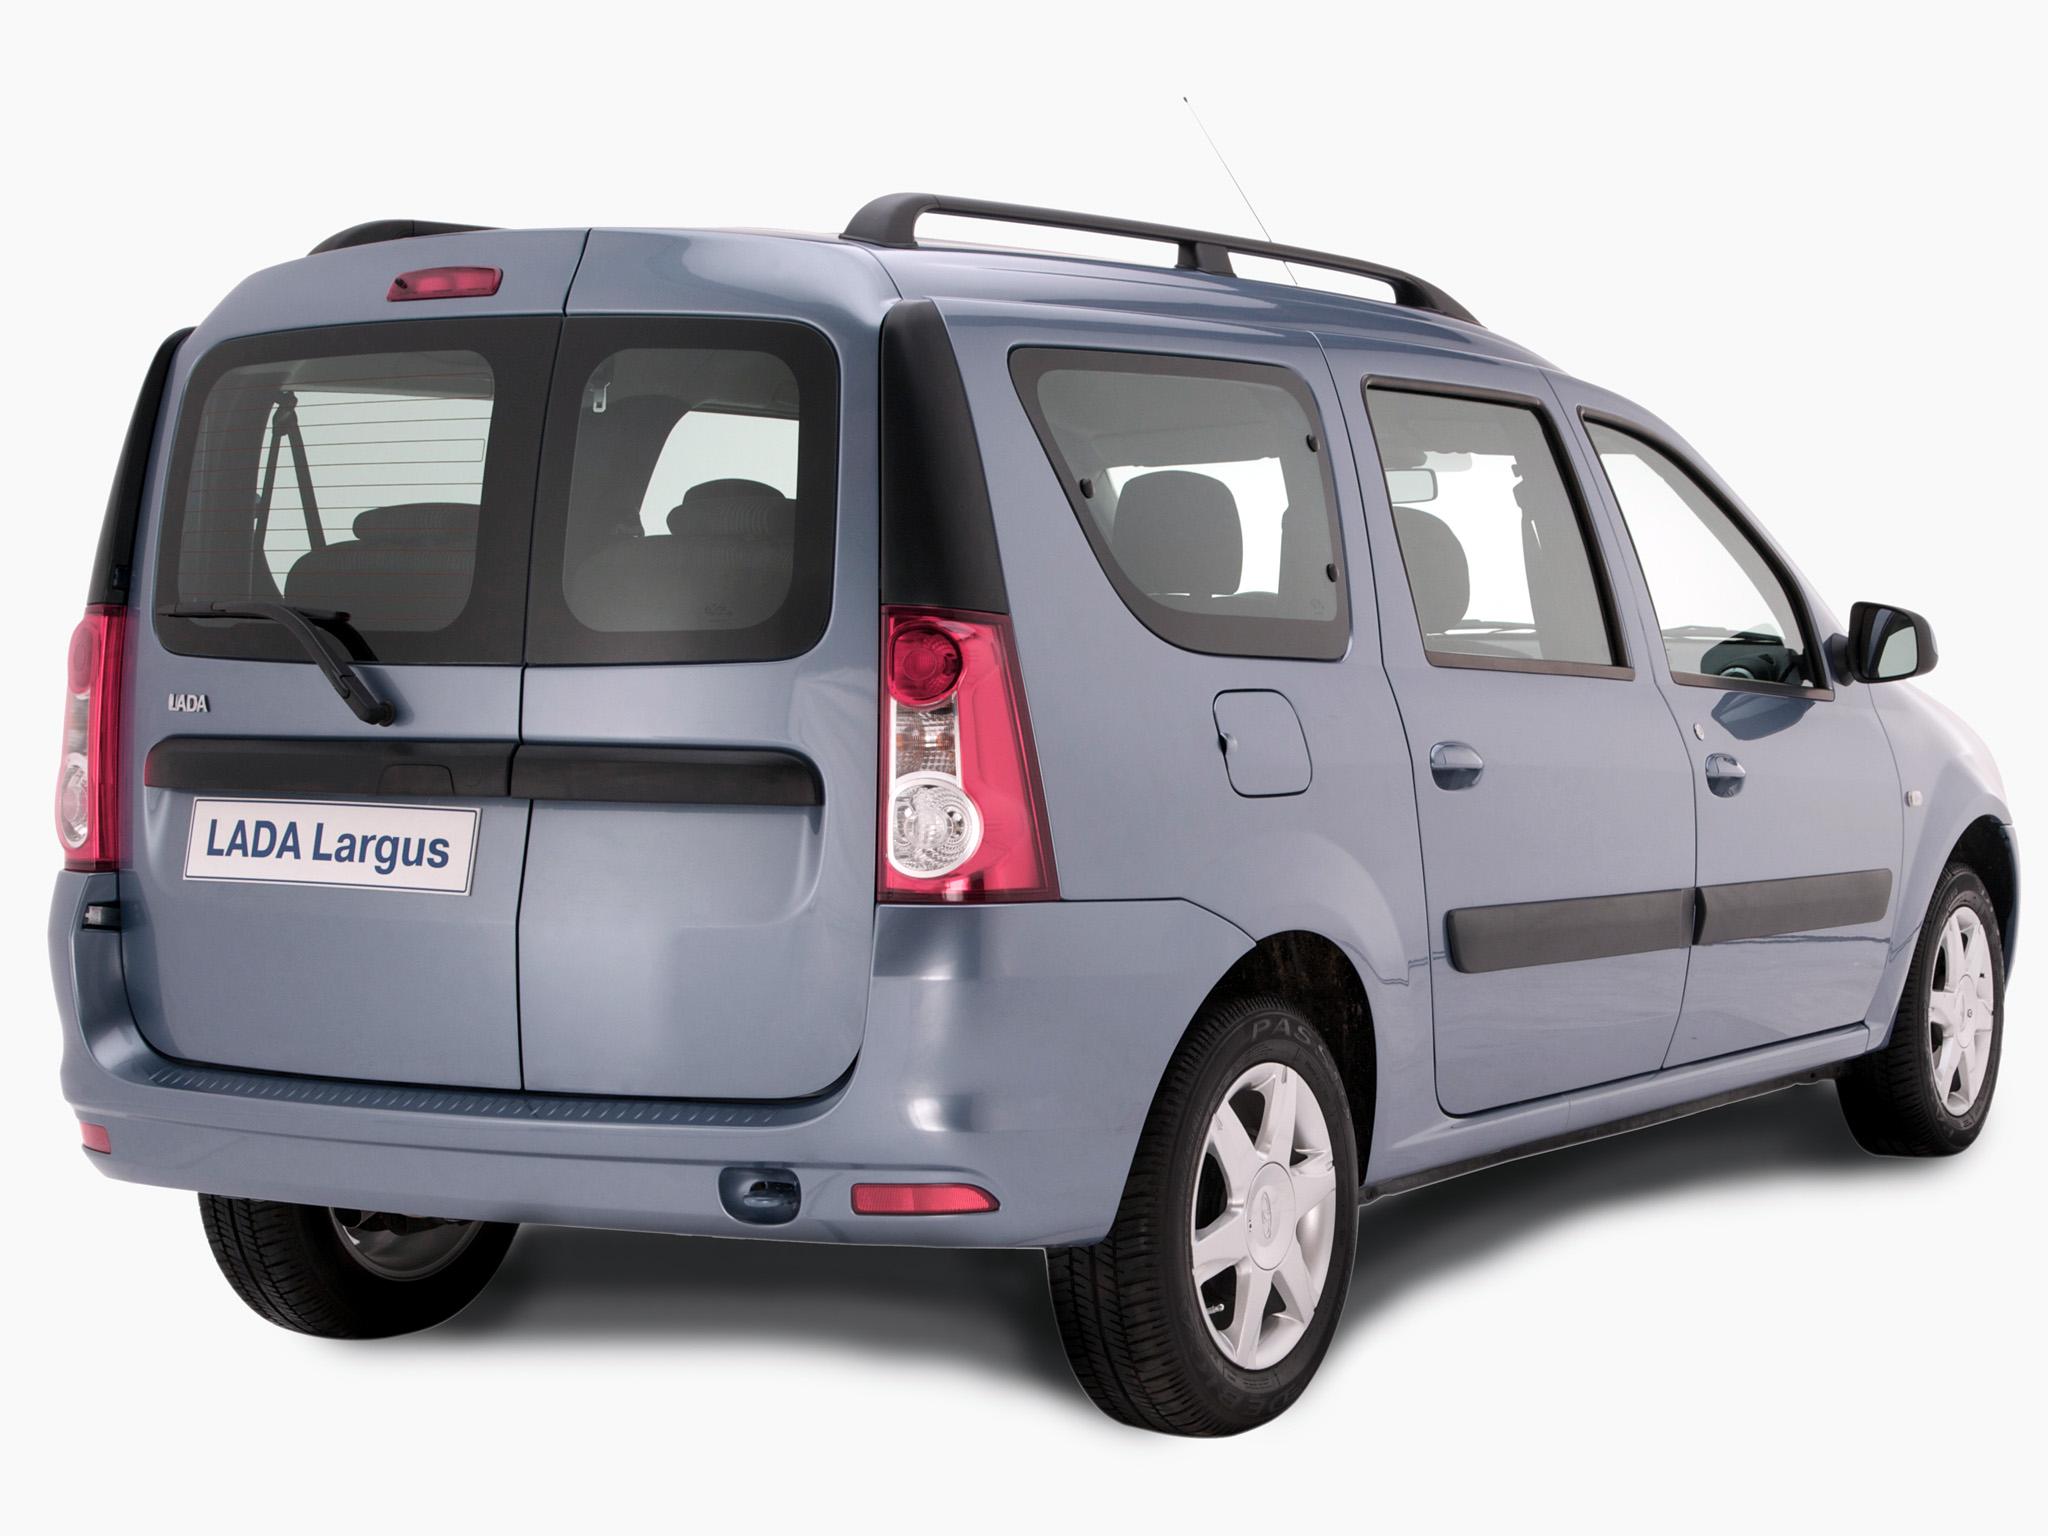 3dtuning of lada largus passenger van 2012 unique on line car configurator for. Black Bedroom Furniture Sets. Home Design Ideas